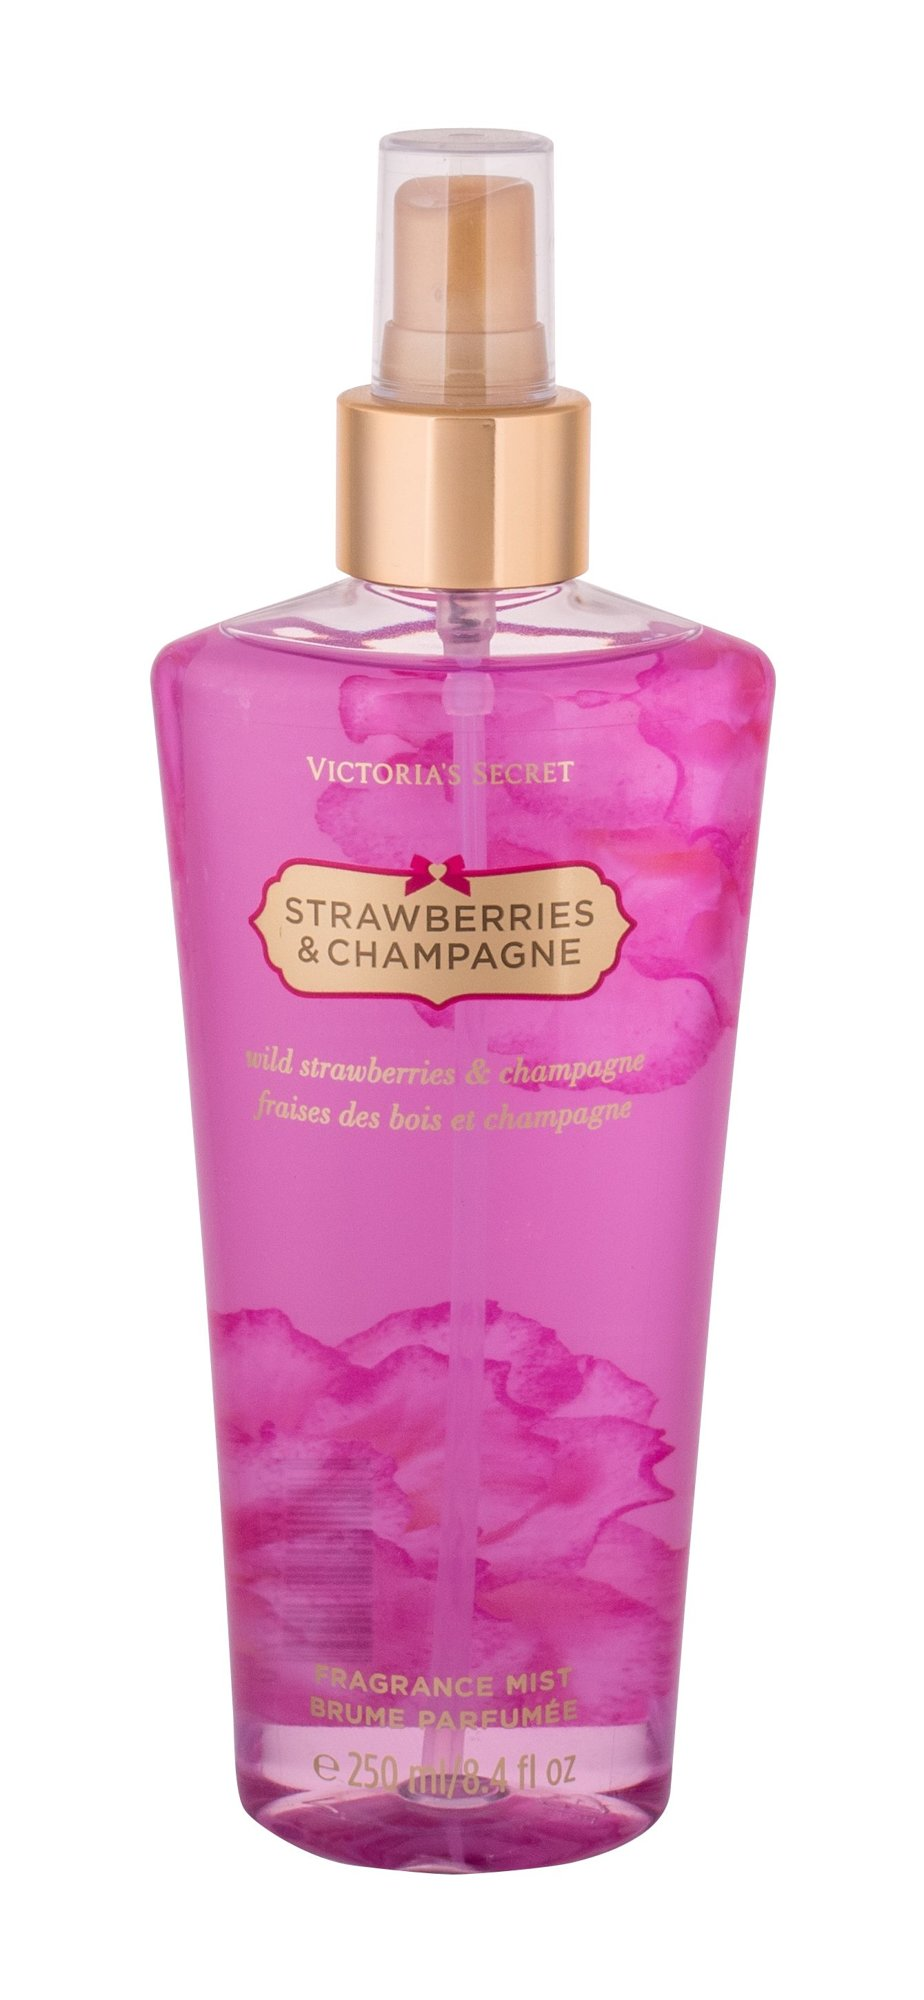 Victoria´s Secret Strawberries & Champagne Nourishing body spray 250ml